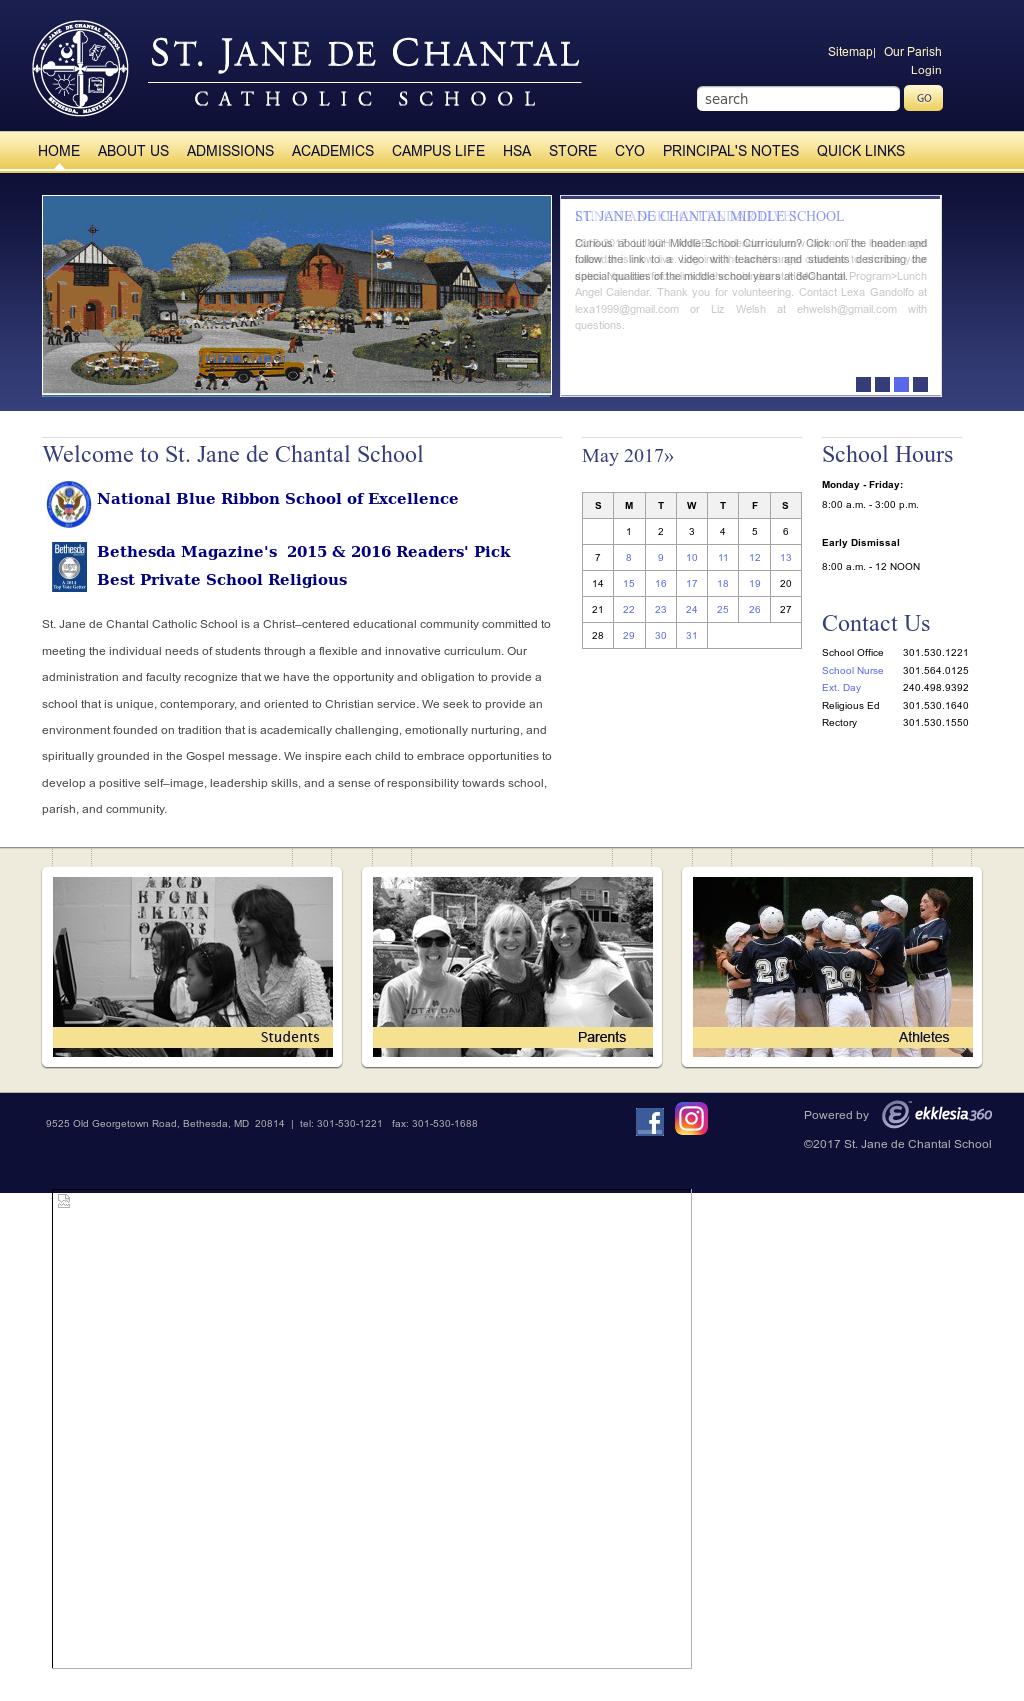 St Jane De Chantal School Competitors, Revenue and Employees